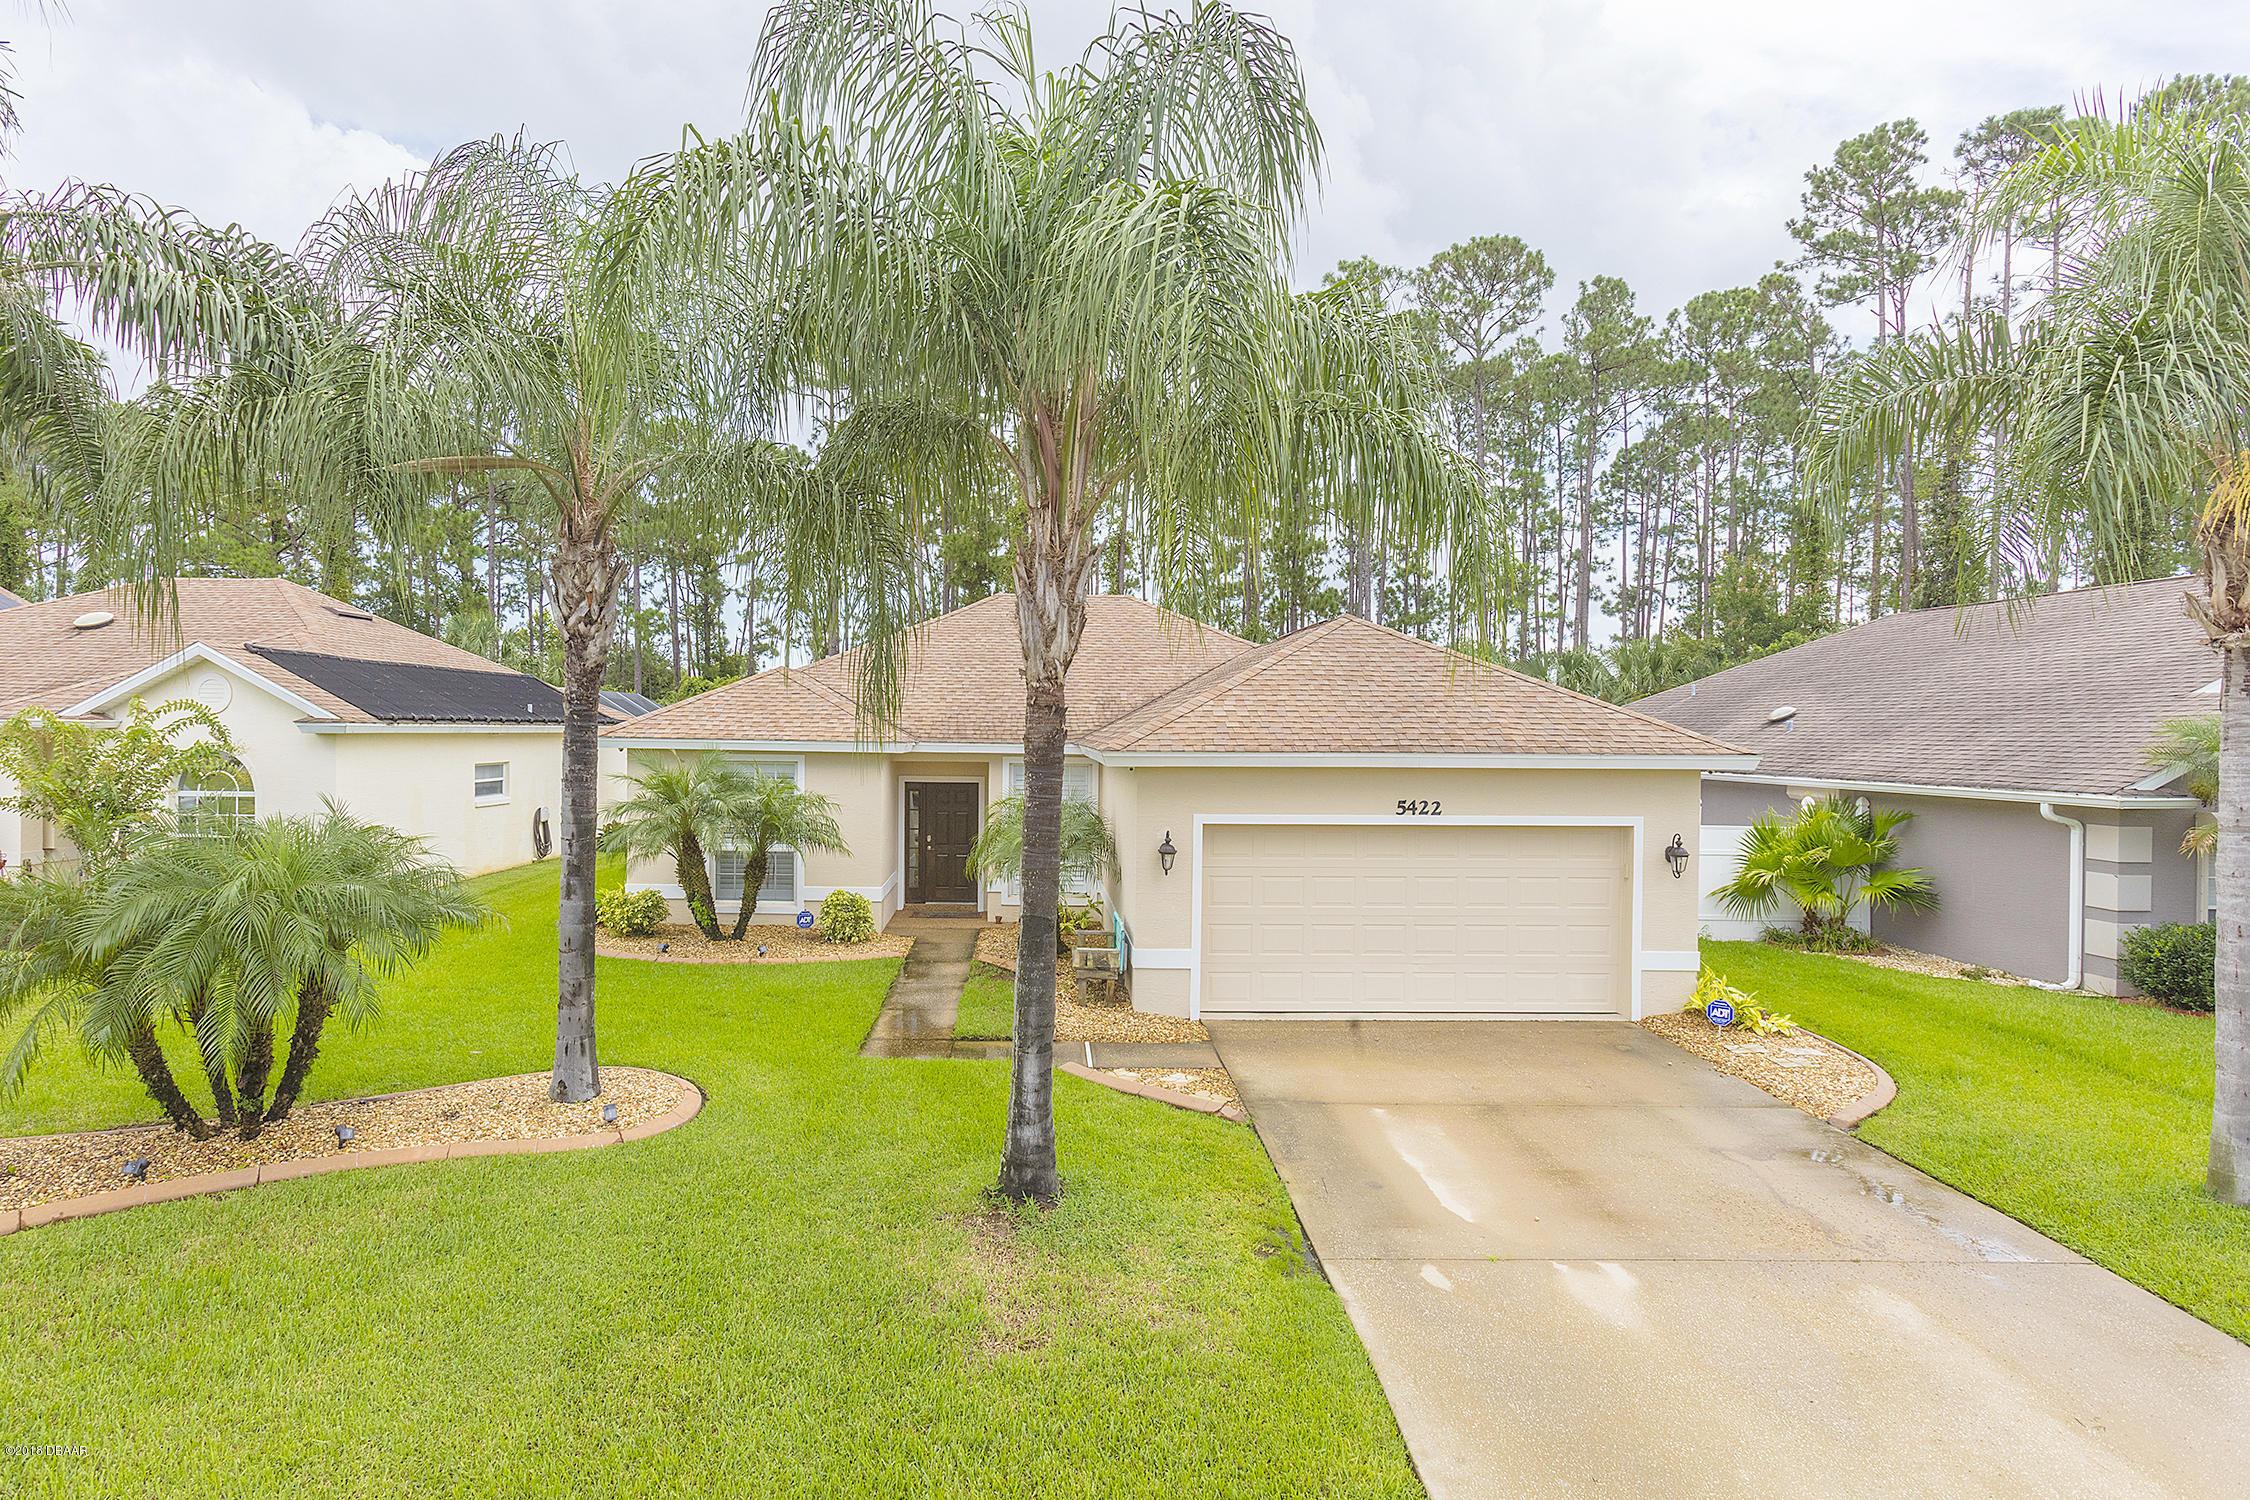 Photo of 5422 Frederick Lake Drive, Port Orange, FL 32128